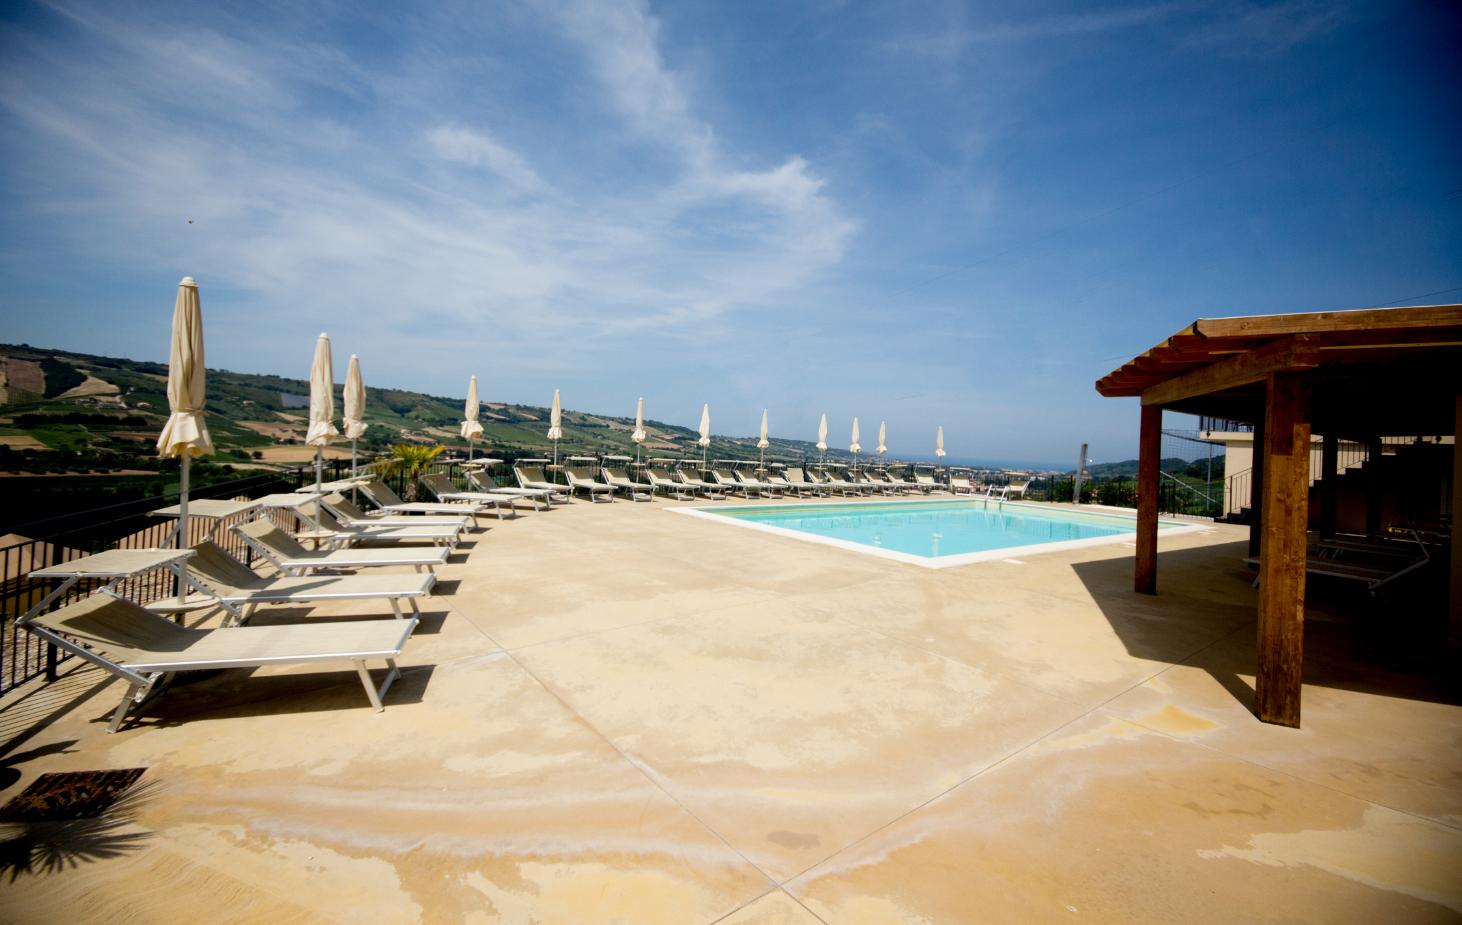 zwembad villa alwin